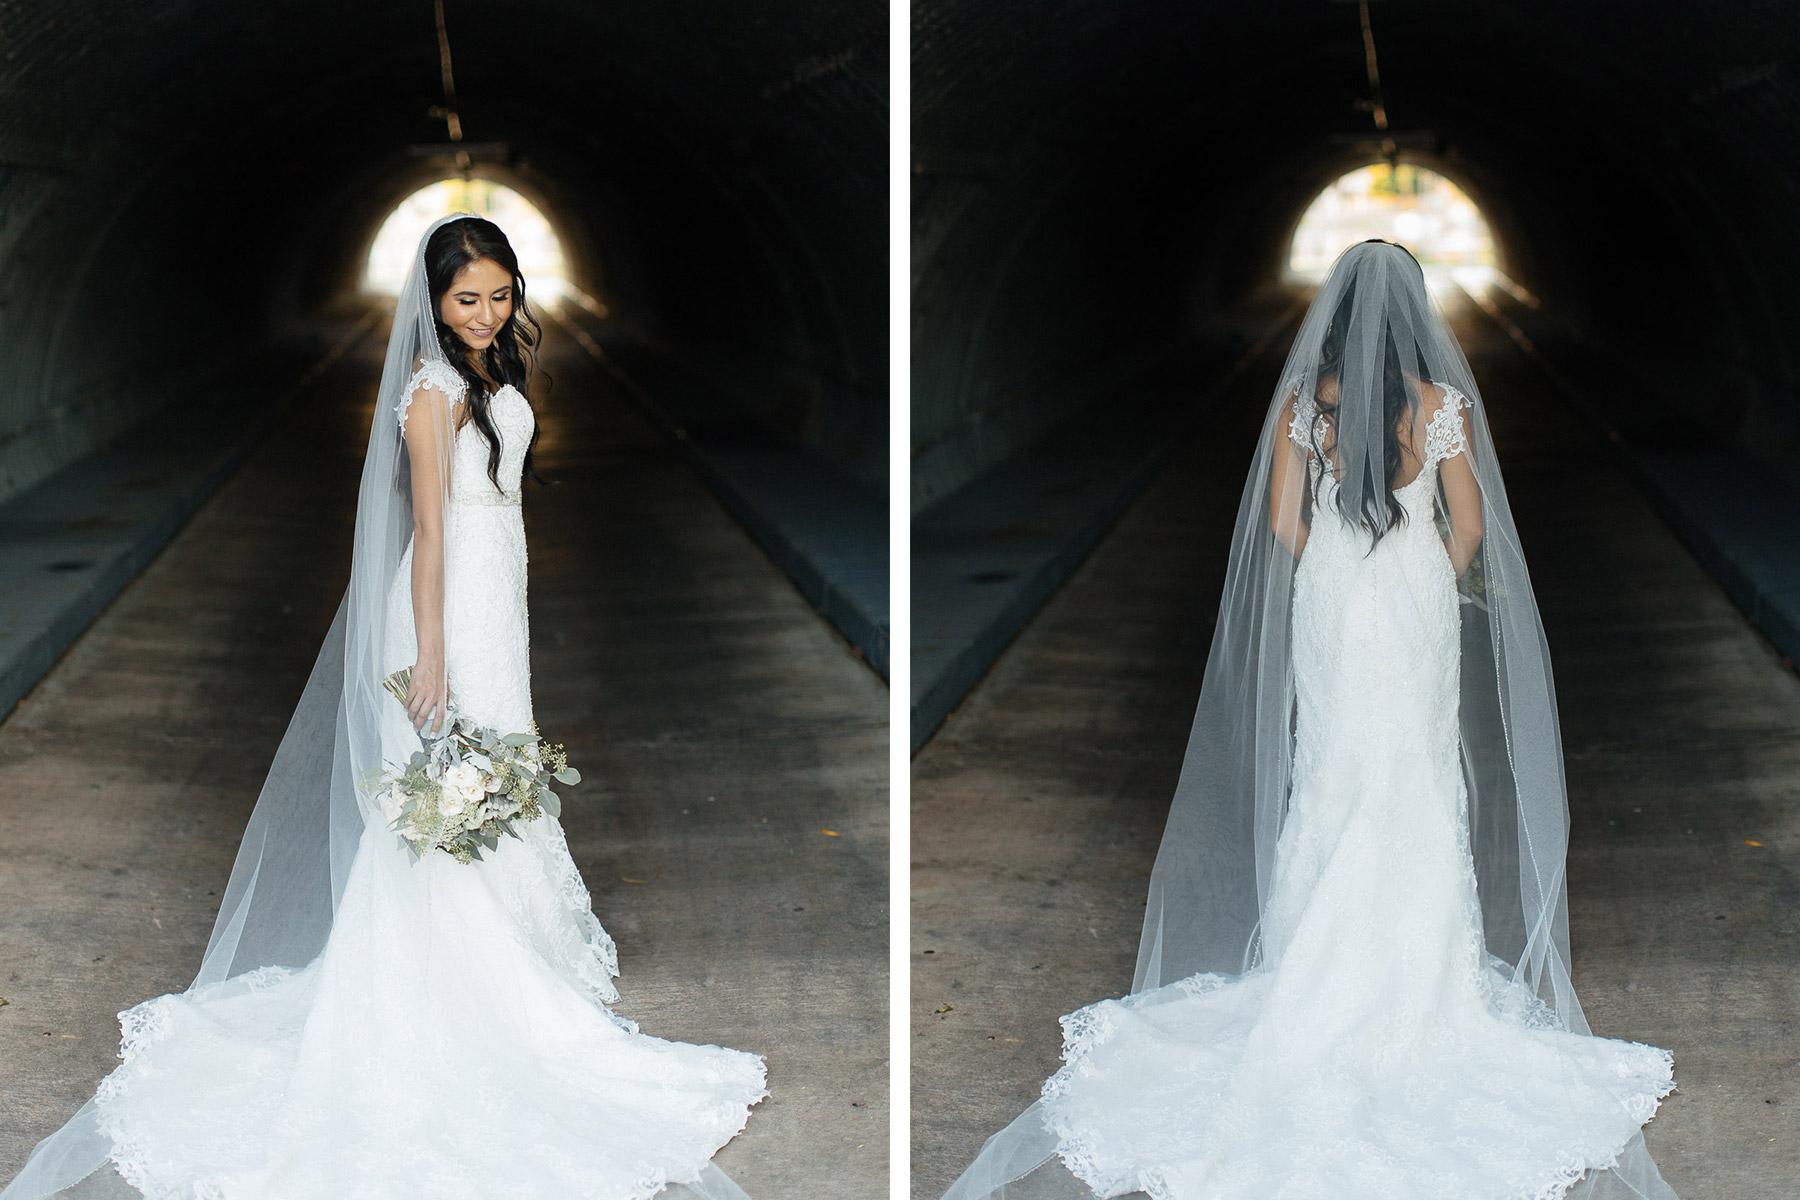 161029-Luxium-Weddings-Arizona-Jeff-Griselda-First-Look-Val-Vista-Lakes-Gilber-064a.jpg